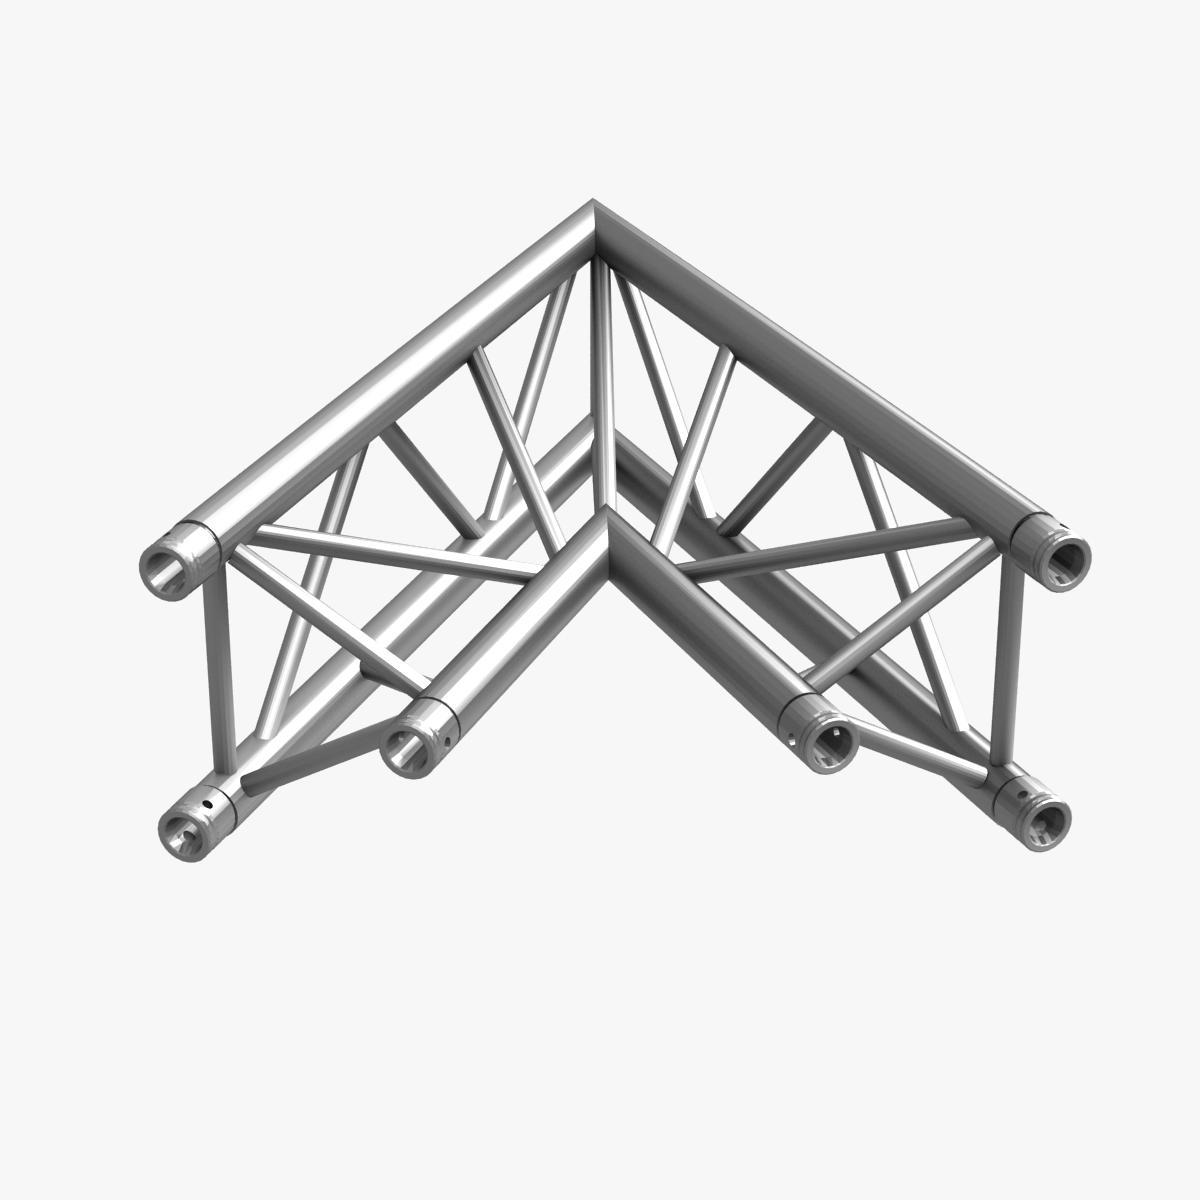 triangular trusses (collection 55 modular pieces) 3d model 3ds max dxf fbx c4d dae texture obj 216231